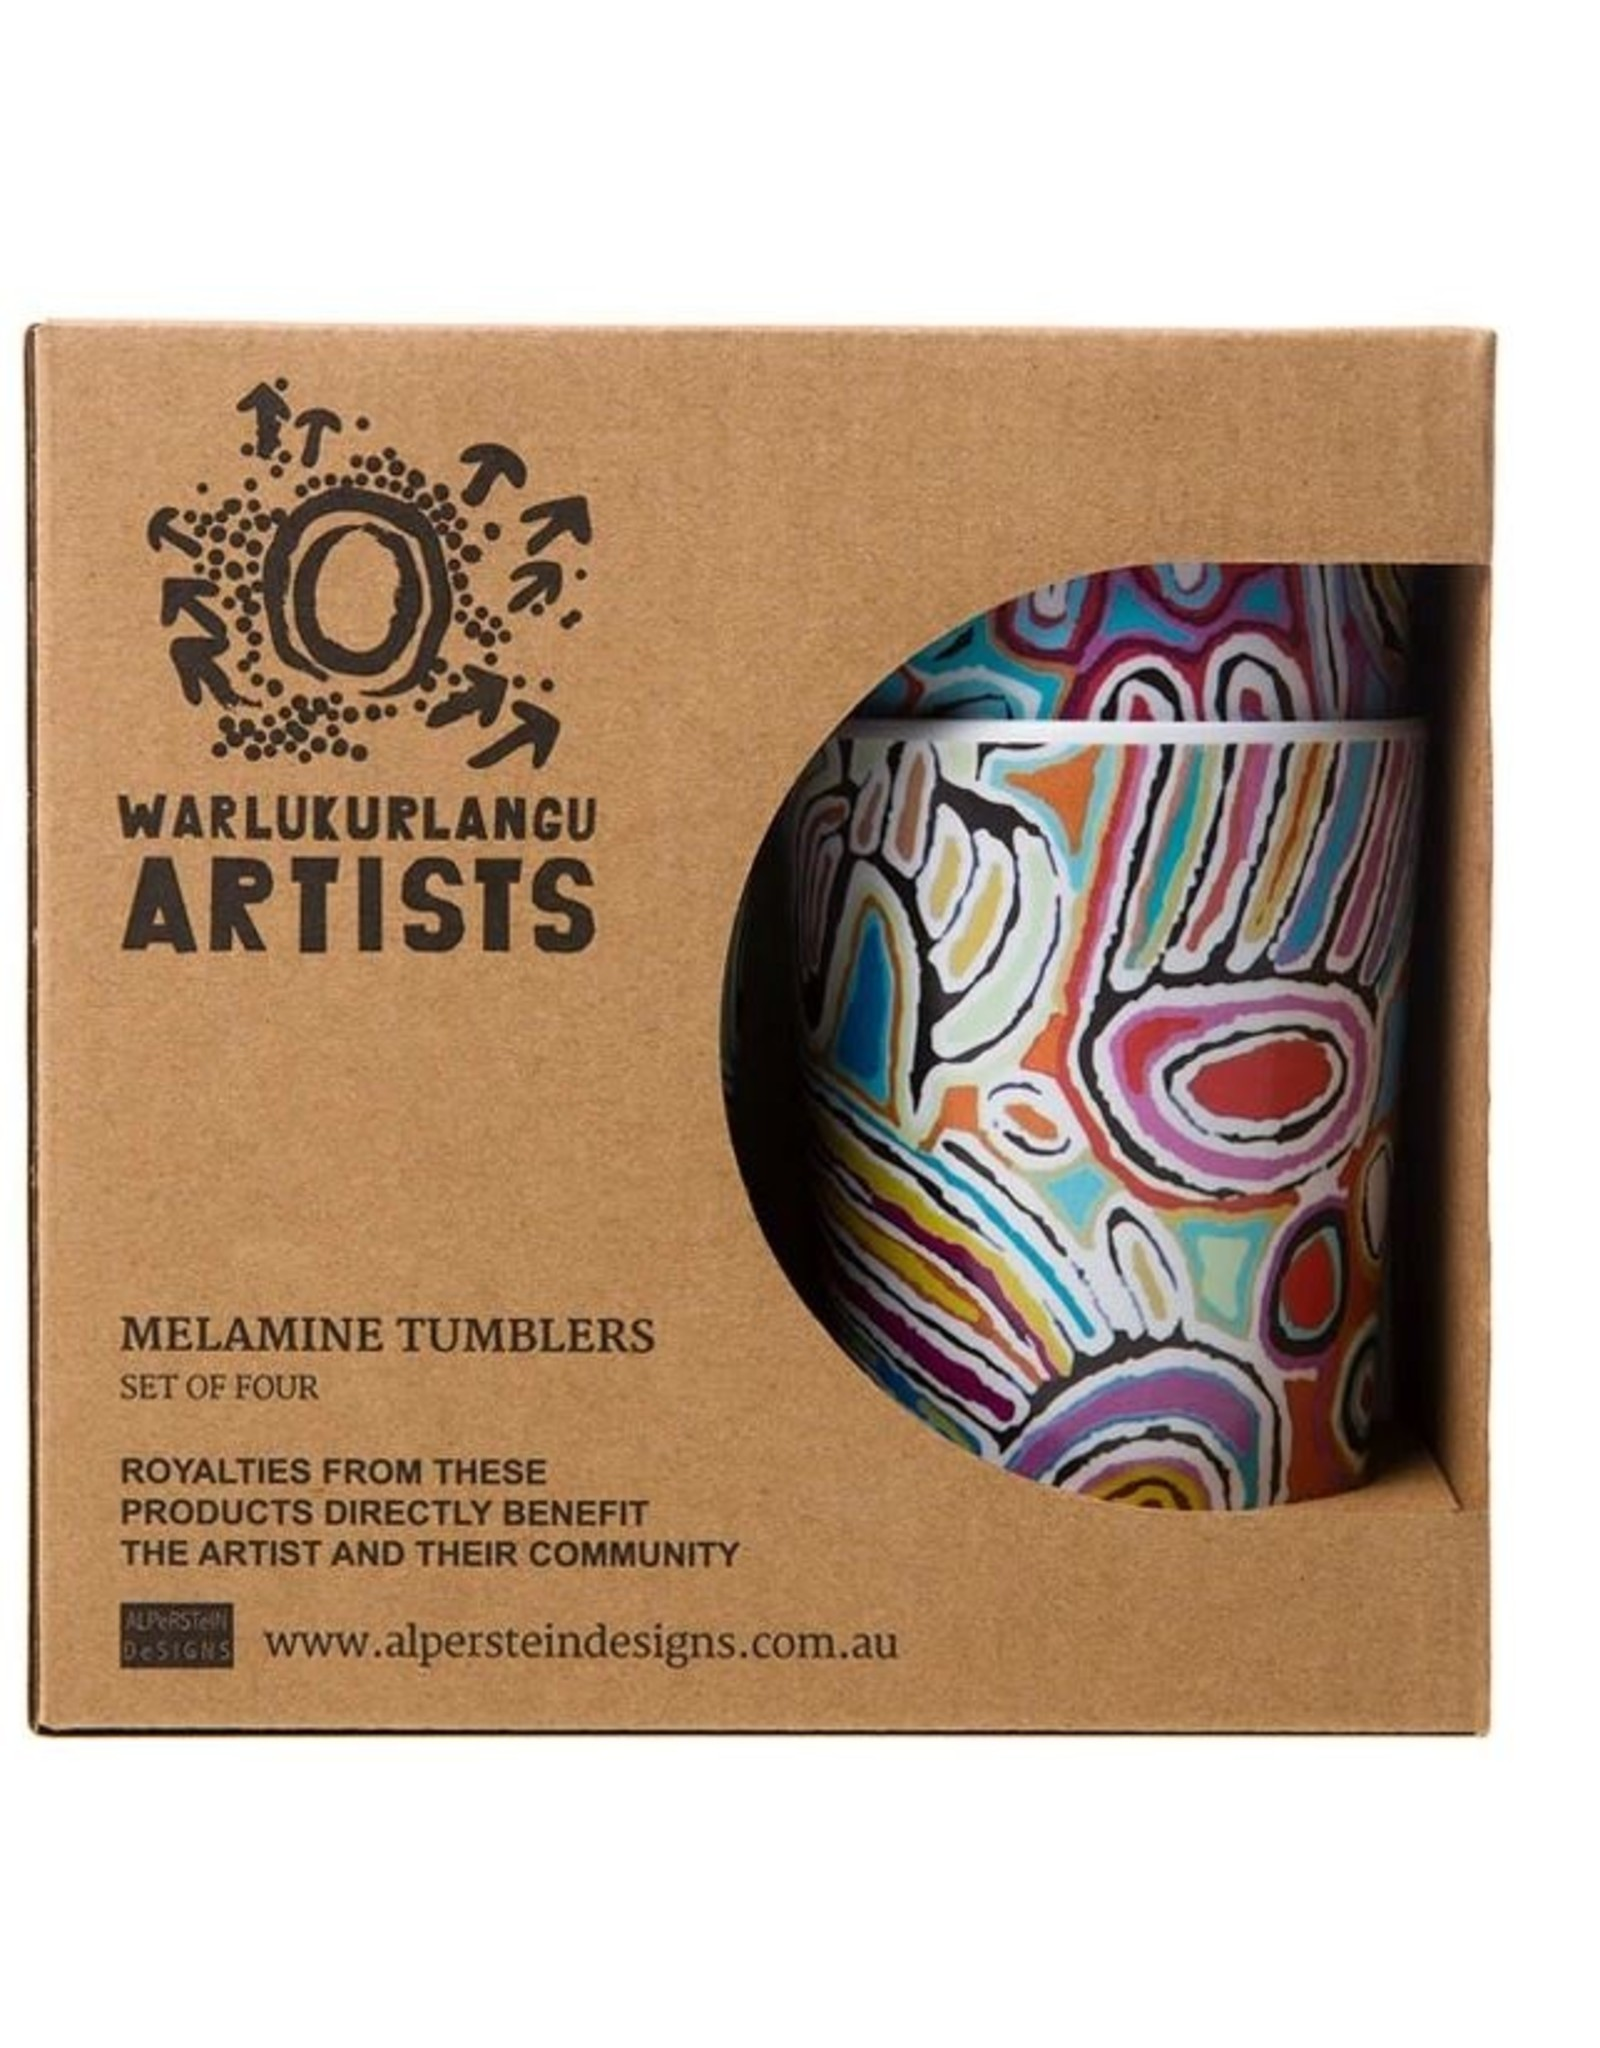 Warlukurlangu Artists Melamine Tumbler Set